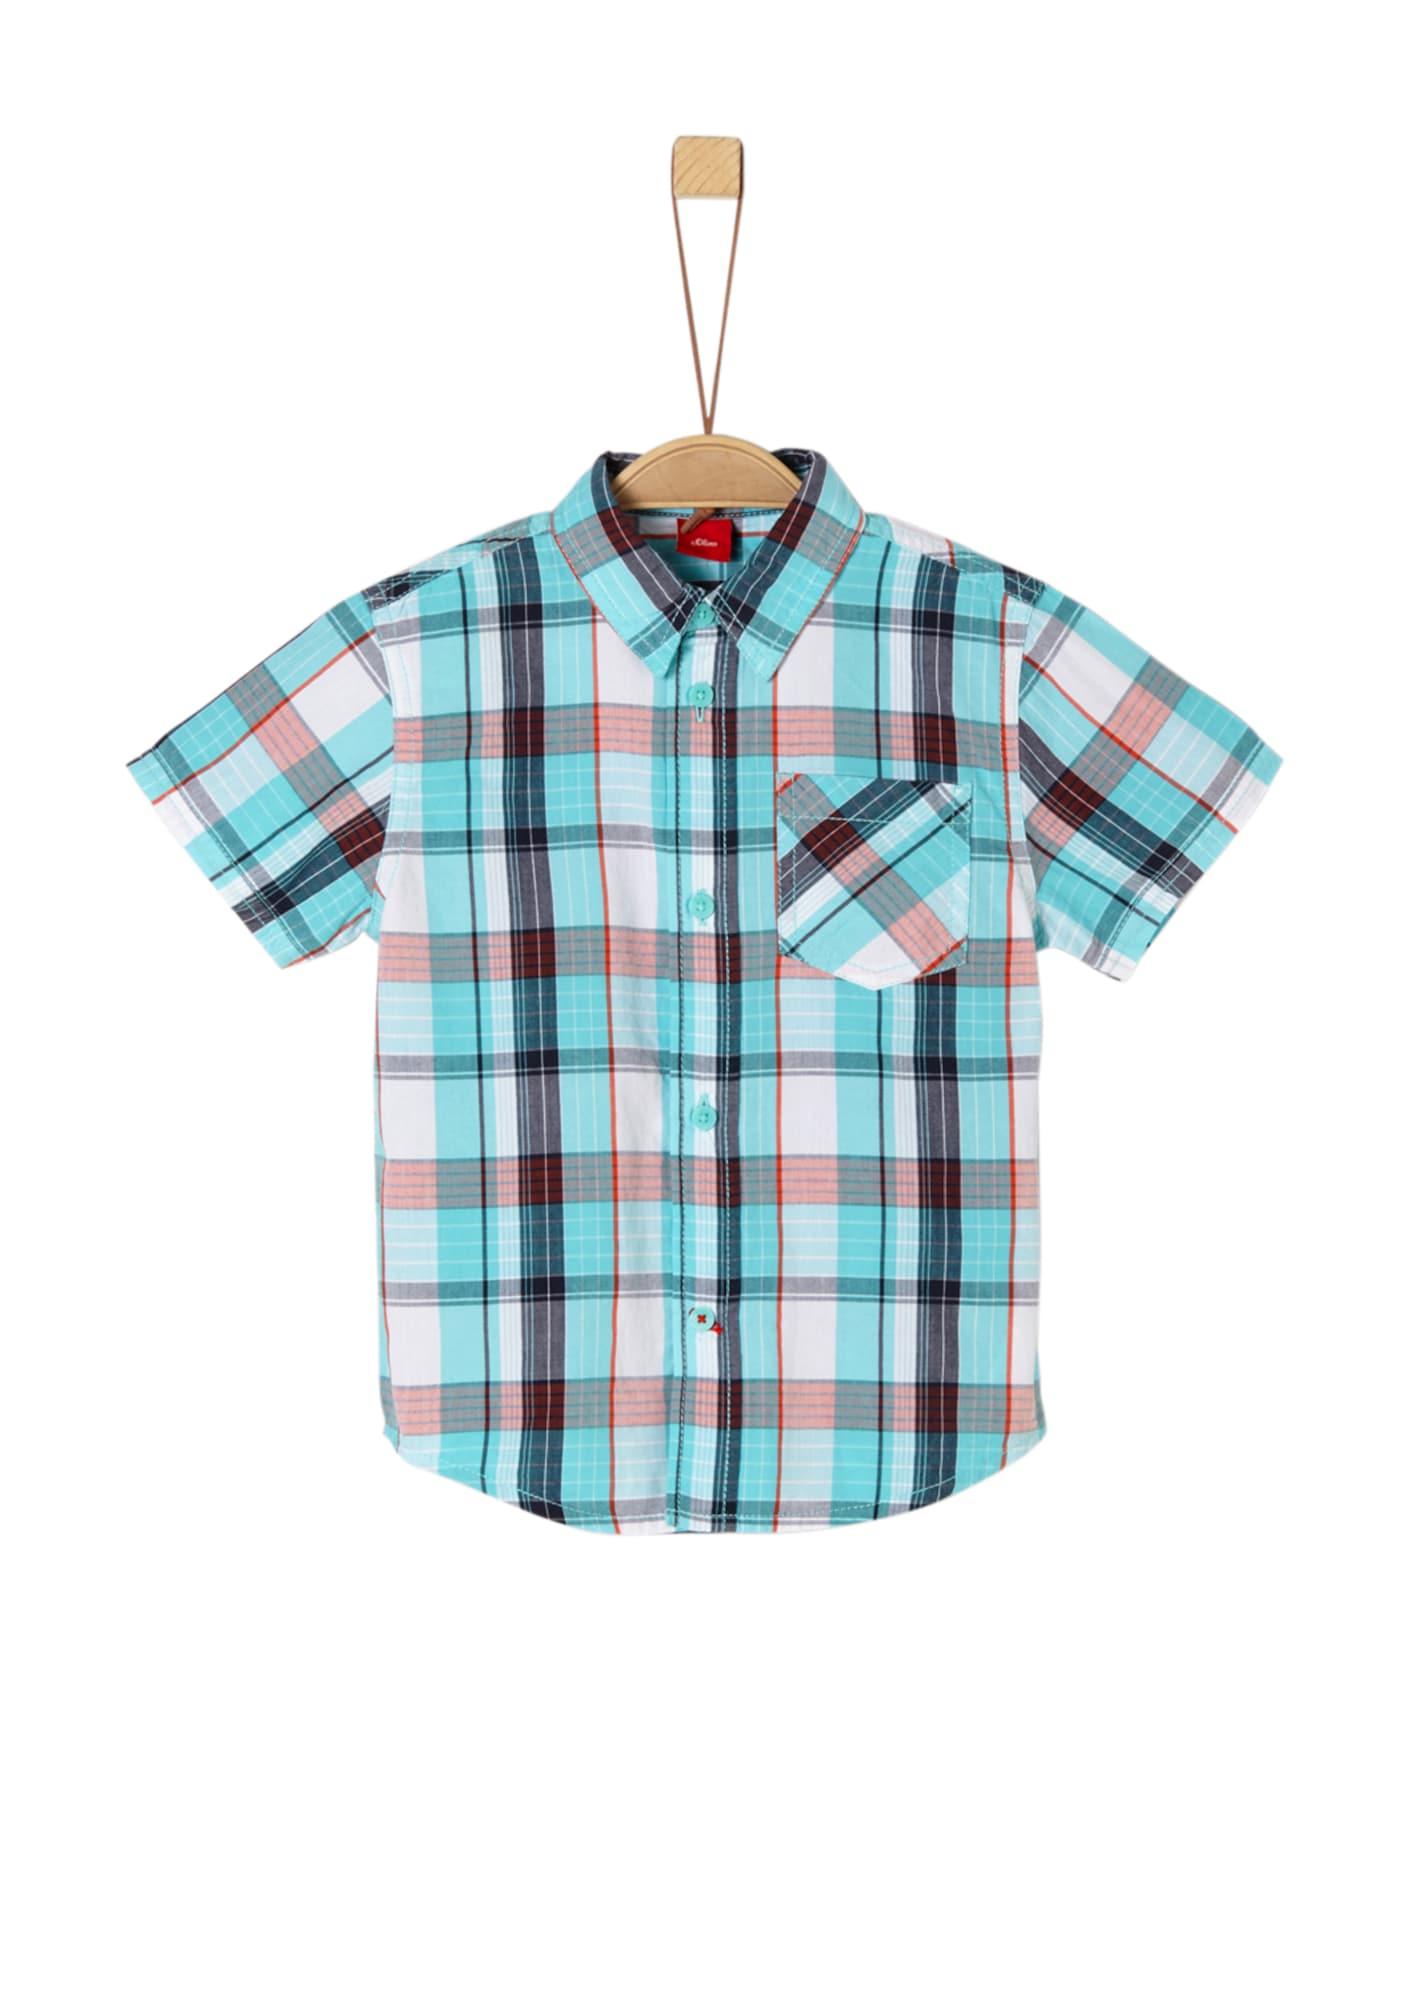 Miniboyoberteile - Kurzarmhemd im Karo Design - Onlineshop ABOUT YOU